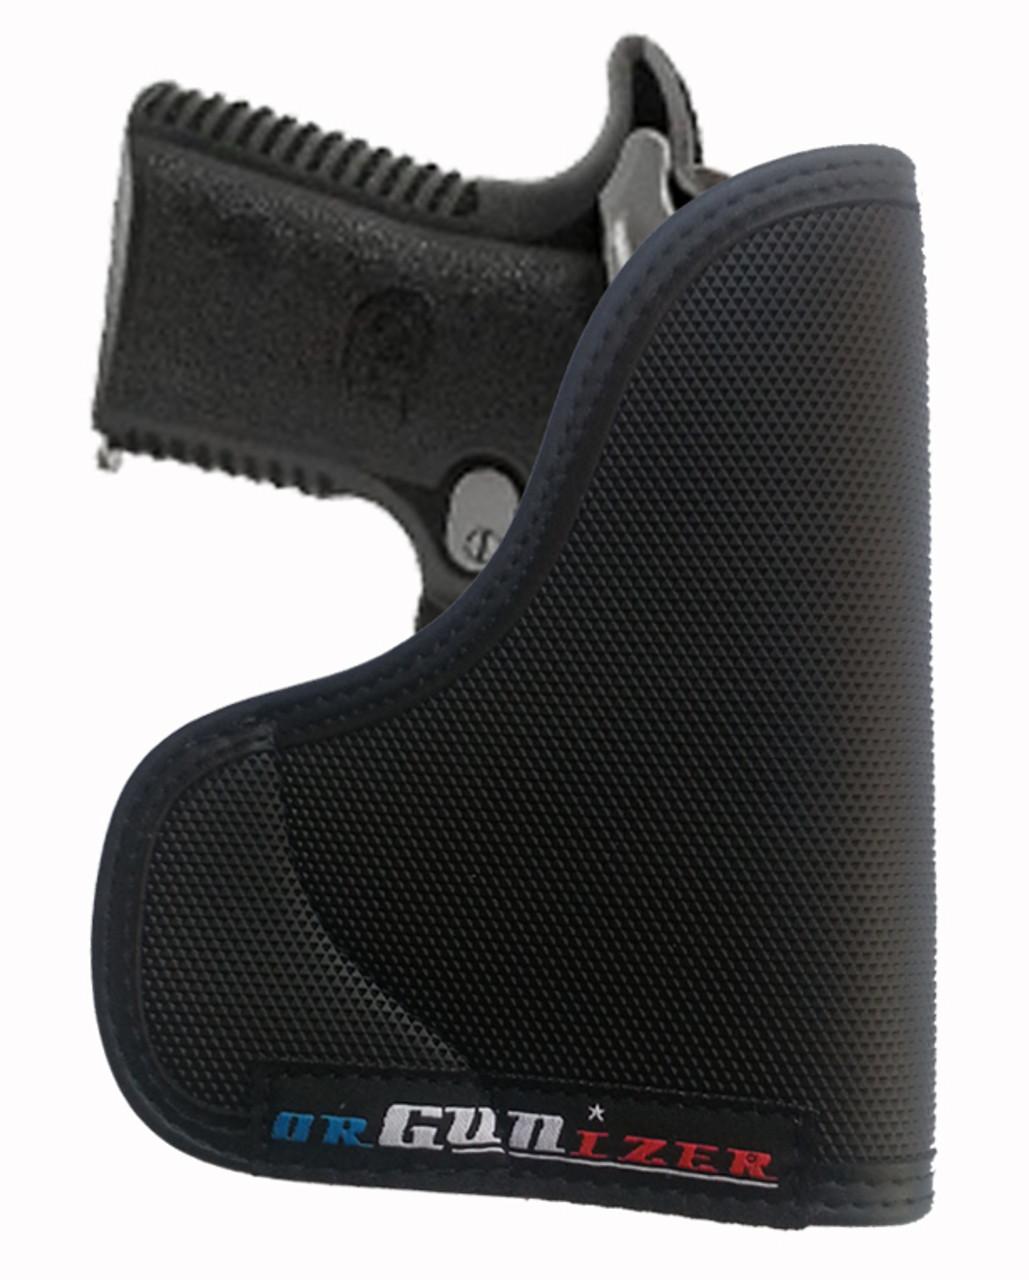 Colt Mustang XSP 380 Auto Ambidextrous orGUNizer Pocket Holster by Garrison Grip (A)